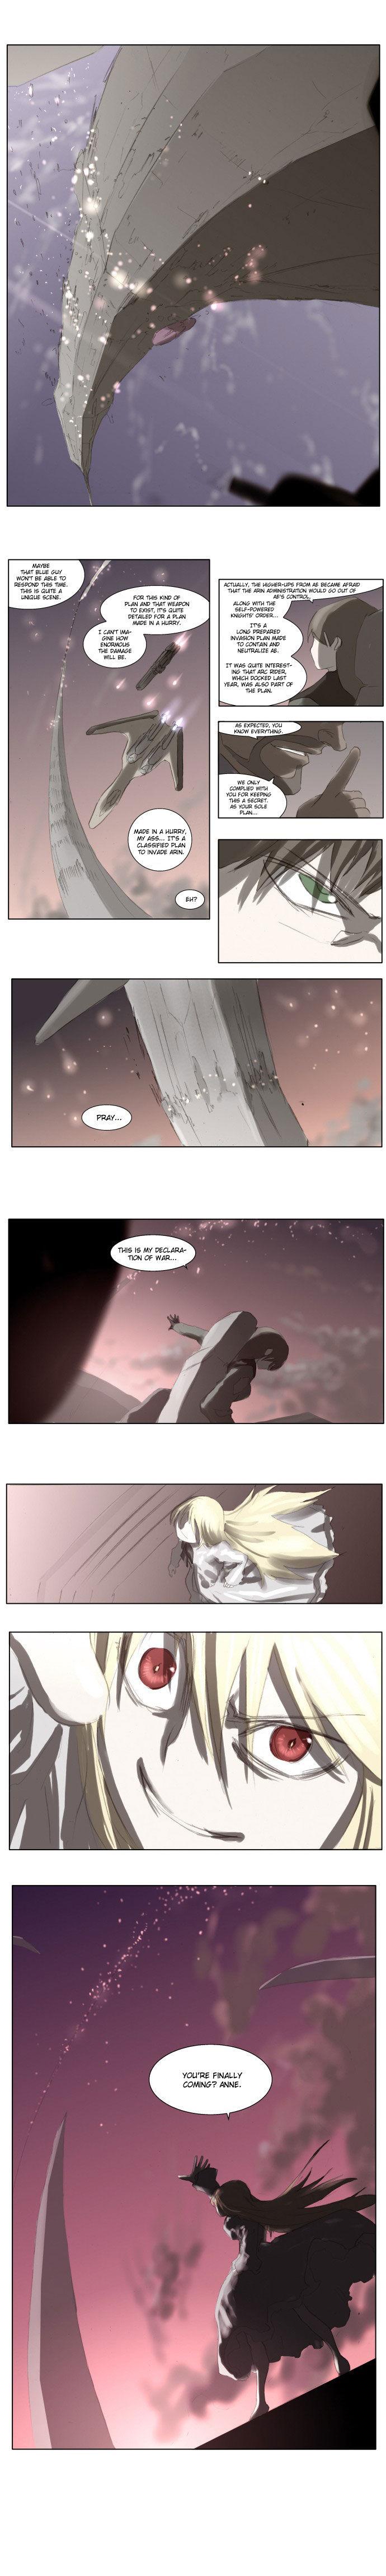 Knight Run 47 Page 2